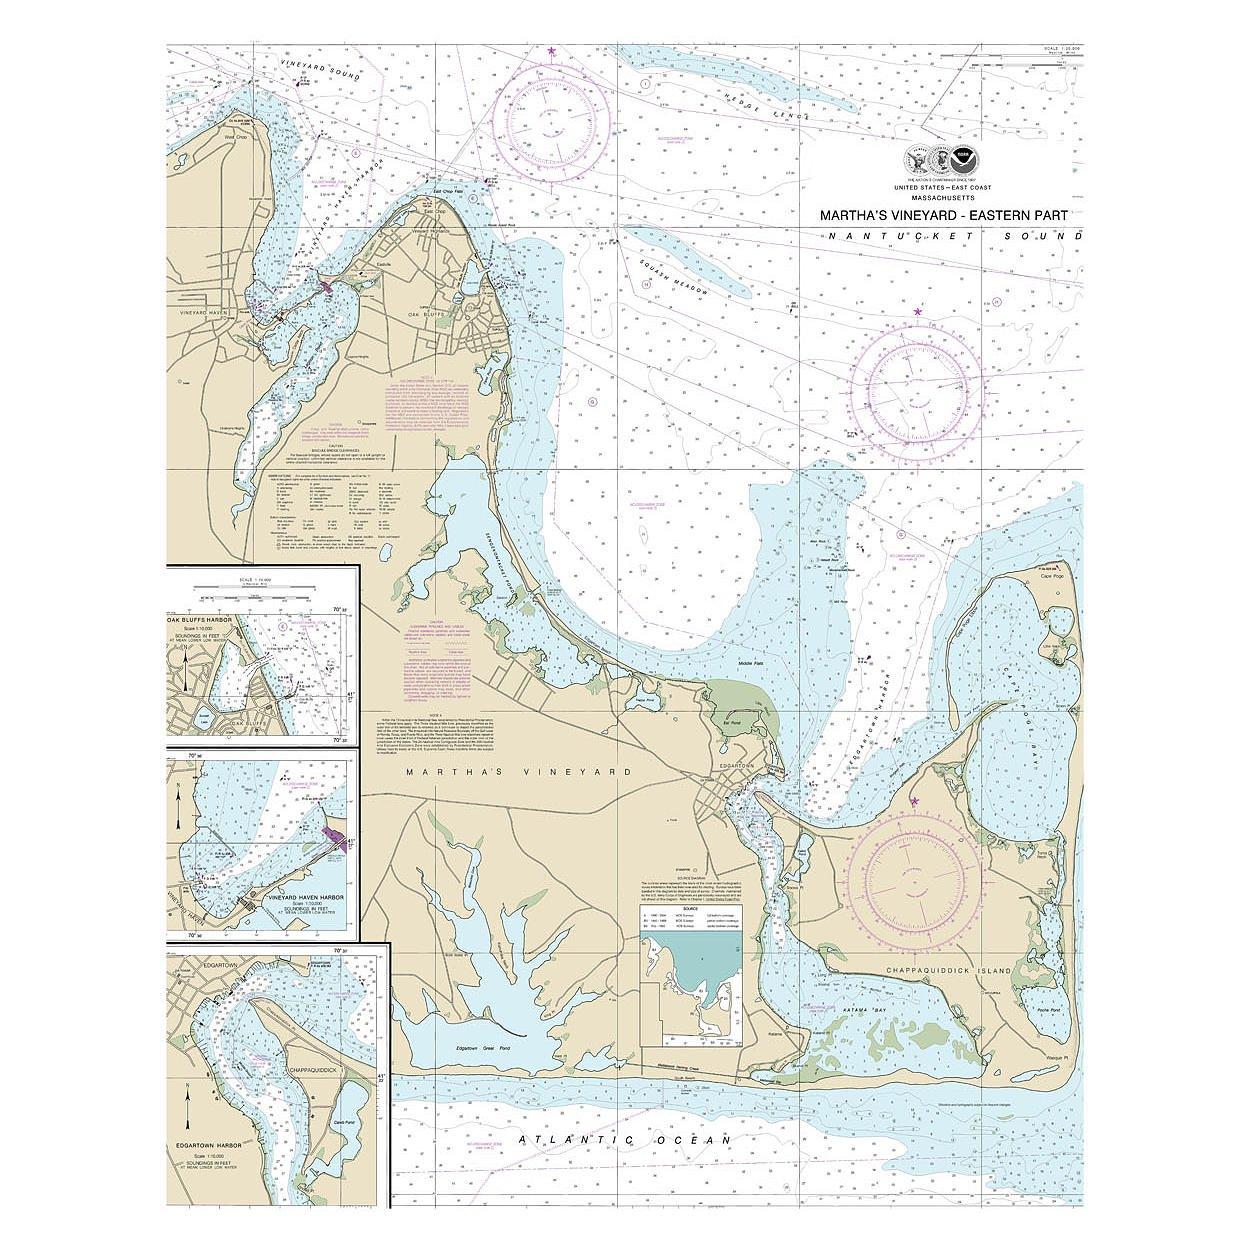 Martha 's Vineyard Nautical Chart Unframedビニールアート印刷 – Perfect for室内/室外。全天候型。 36X48 VINYL00853648 B076DKYBFN  36X48